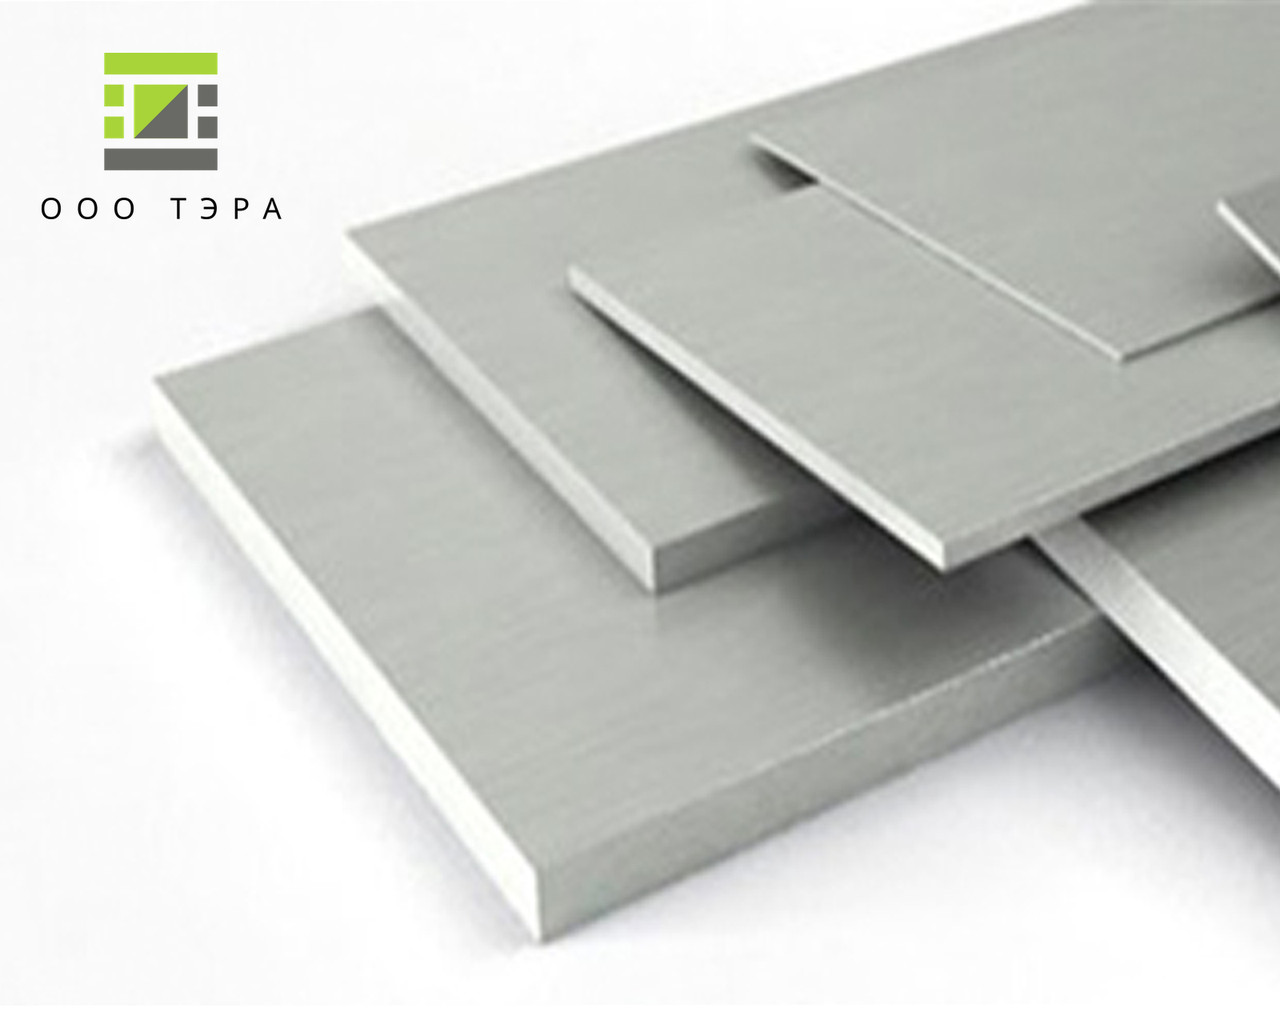 Алюминиевый профиль шина 70 мм дюралевая 2017 (Д1Т); 70х10; 70х30 мм